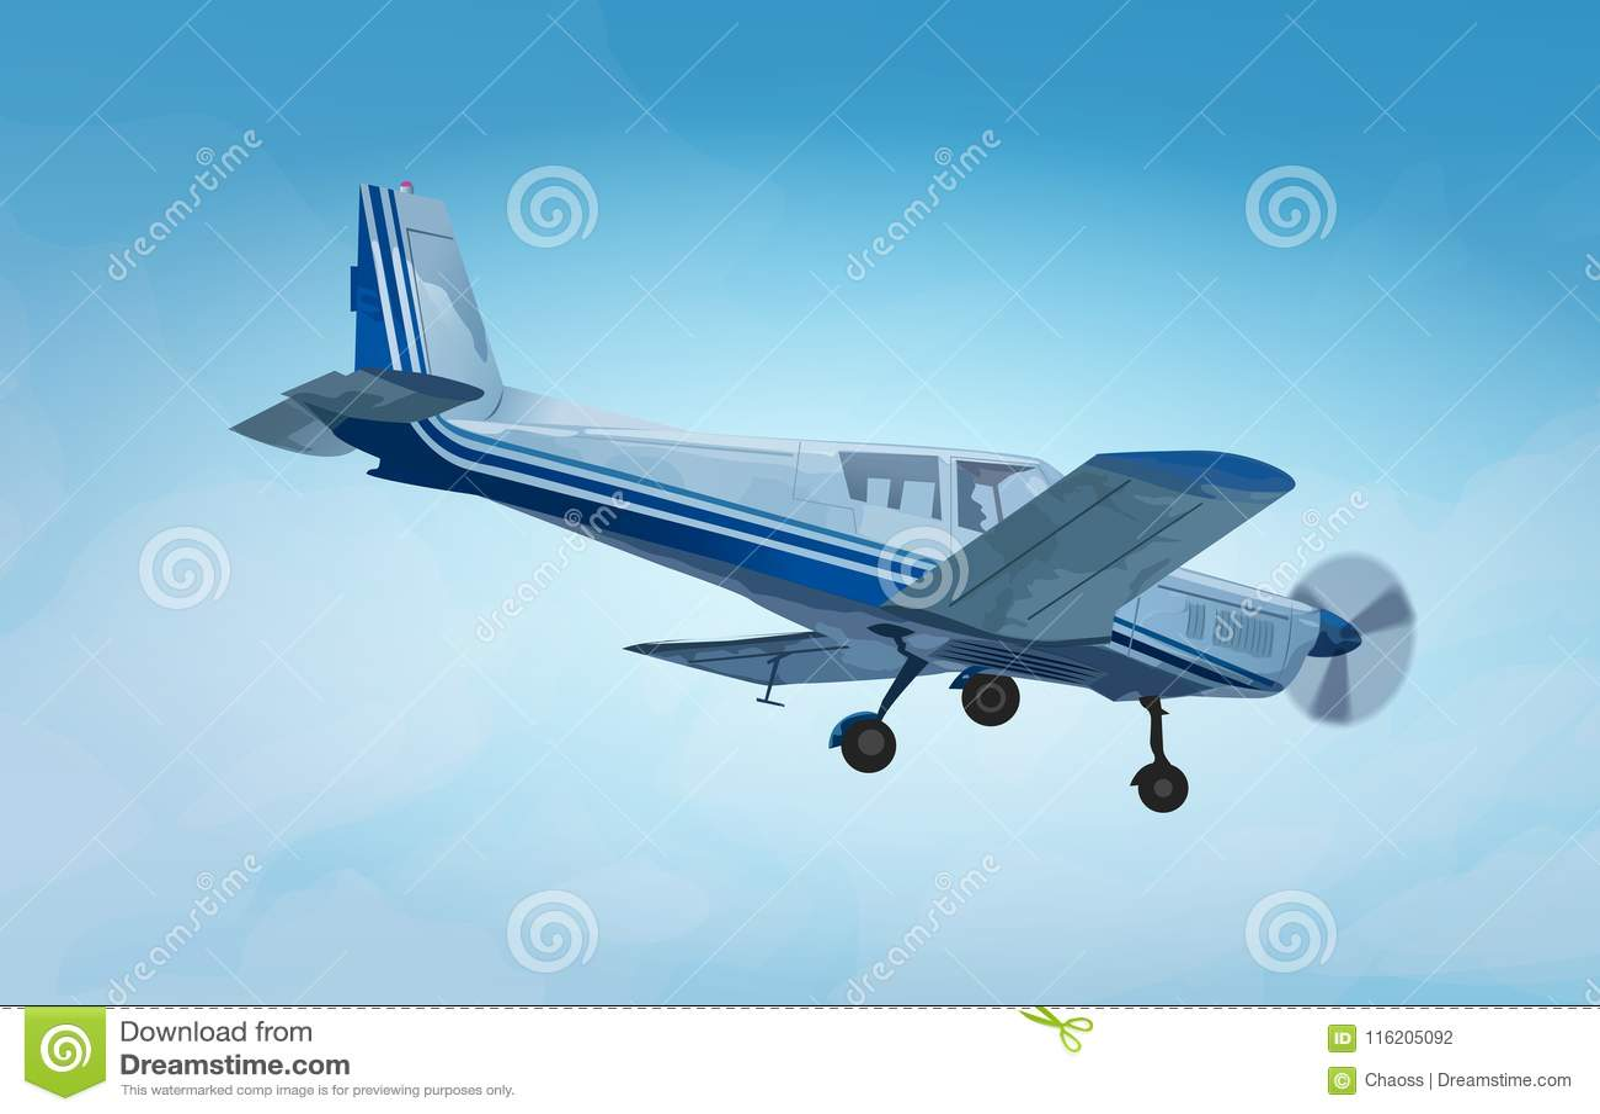 Petit avion privé